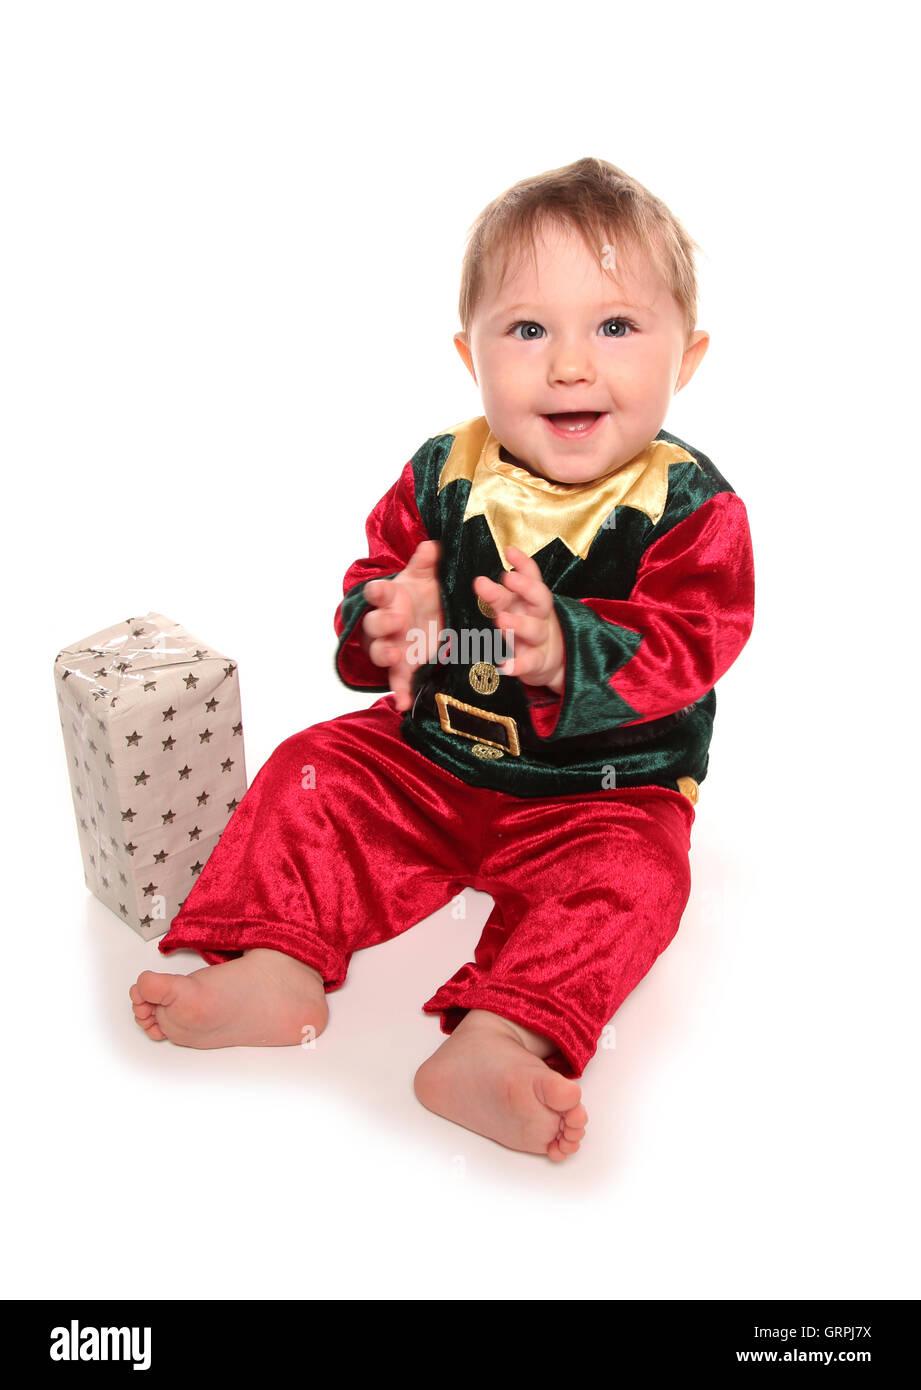 infant dressed in elfs santas little helper fancy dress costume cutout  sc 1 st  Alamy & infant dressed in elfs santas little helper fancy dress costume ...